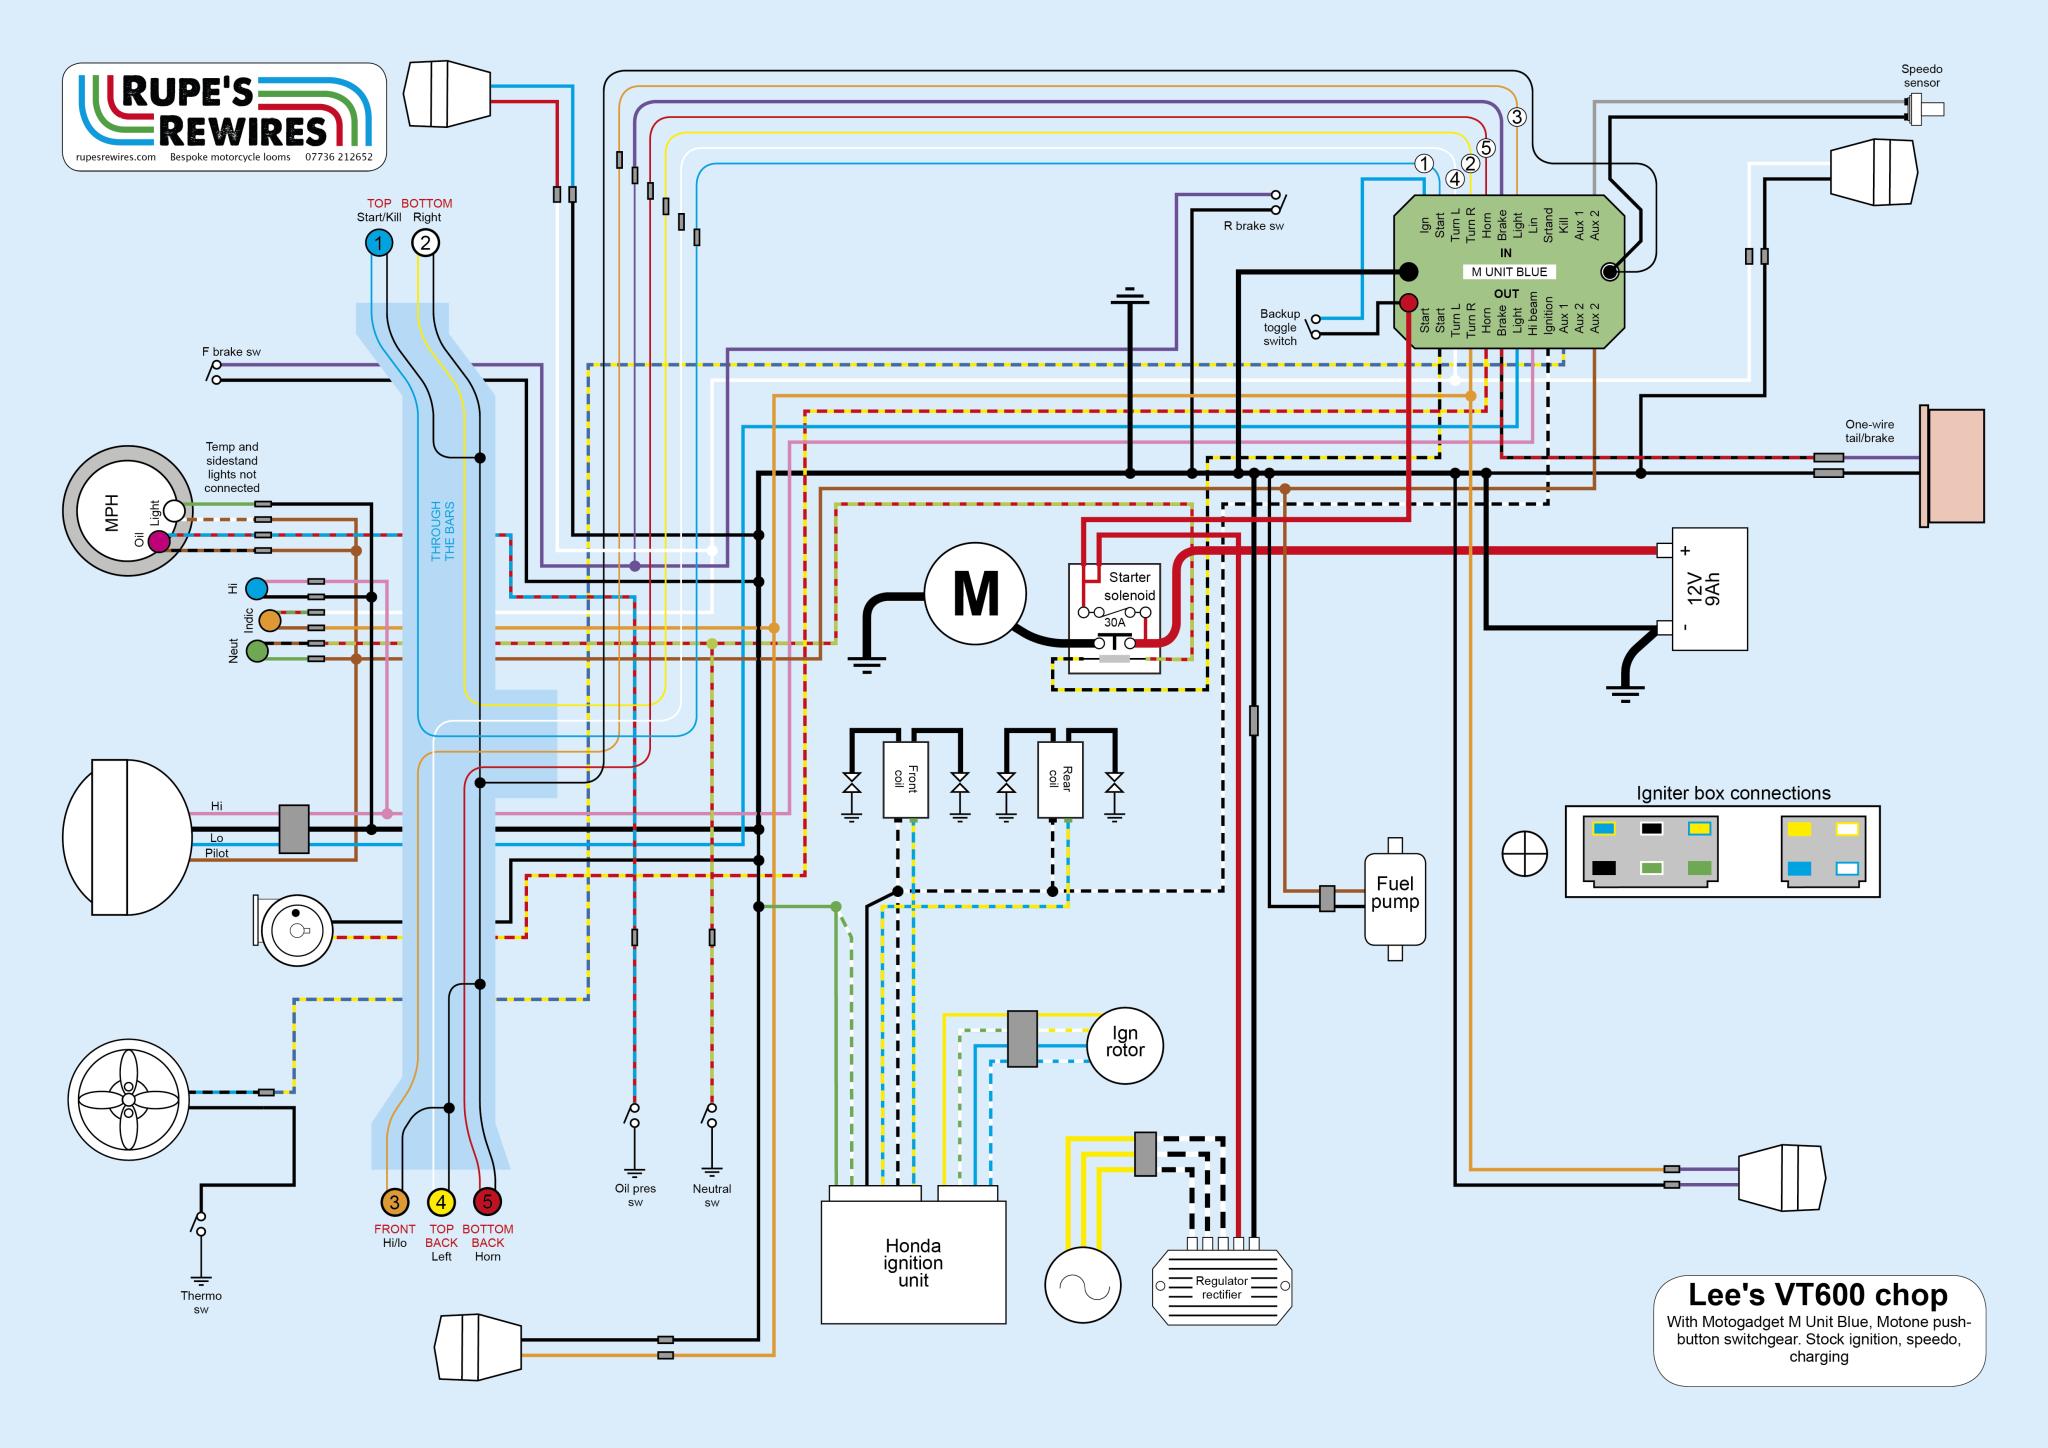 diagram] 1985 honda shadow battery wiring diagram full version hd quality wiring  diagram - phdiagram.cxlecce2021.it  diagram database